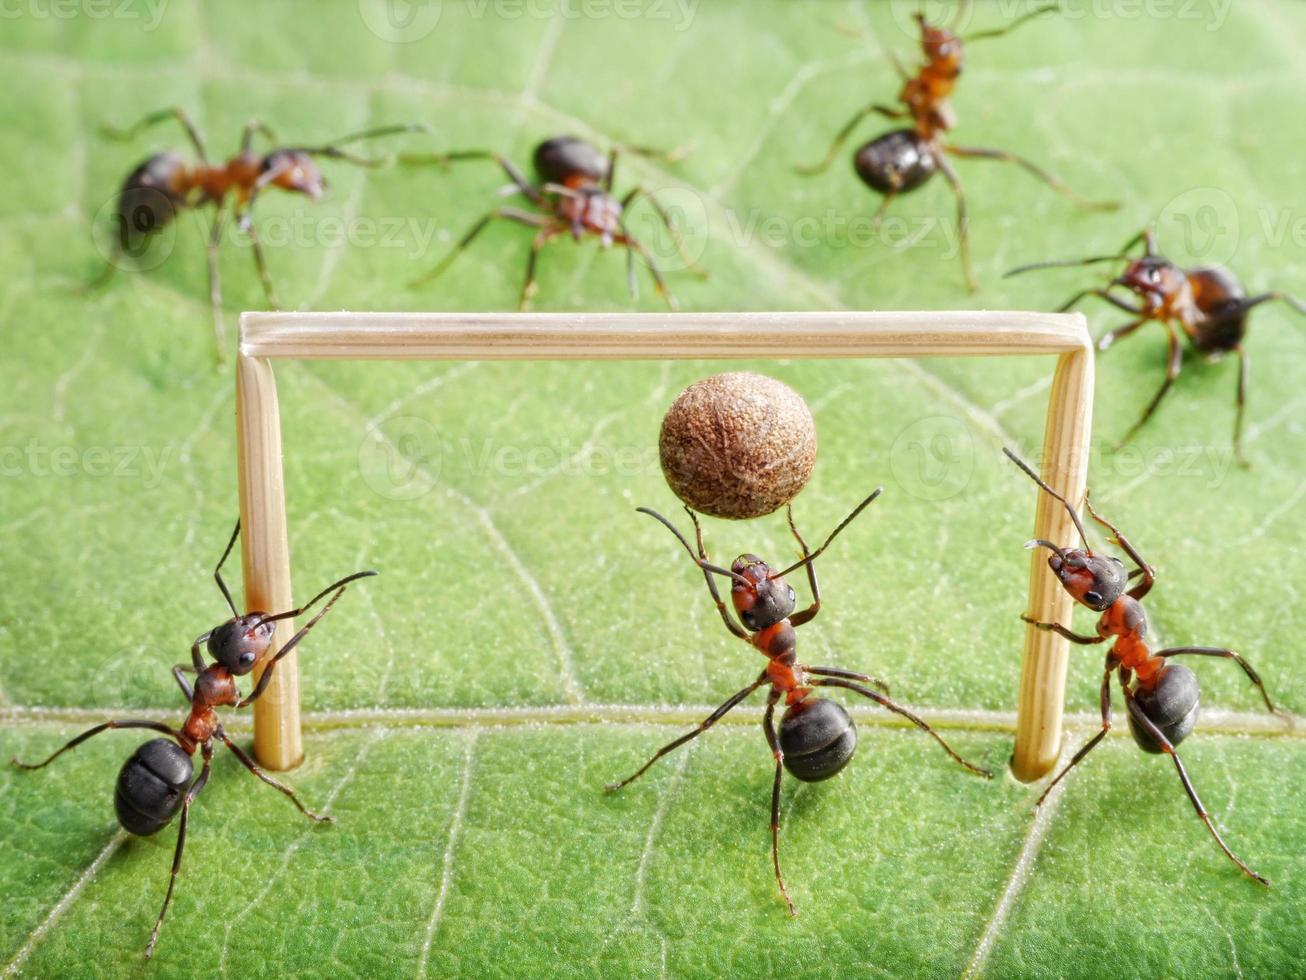 objetivo, formigas jogam futebol foto